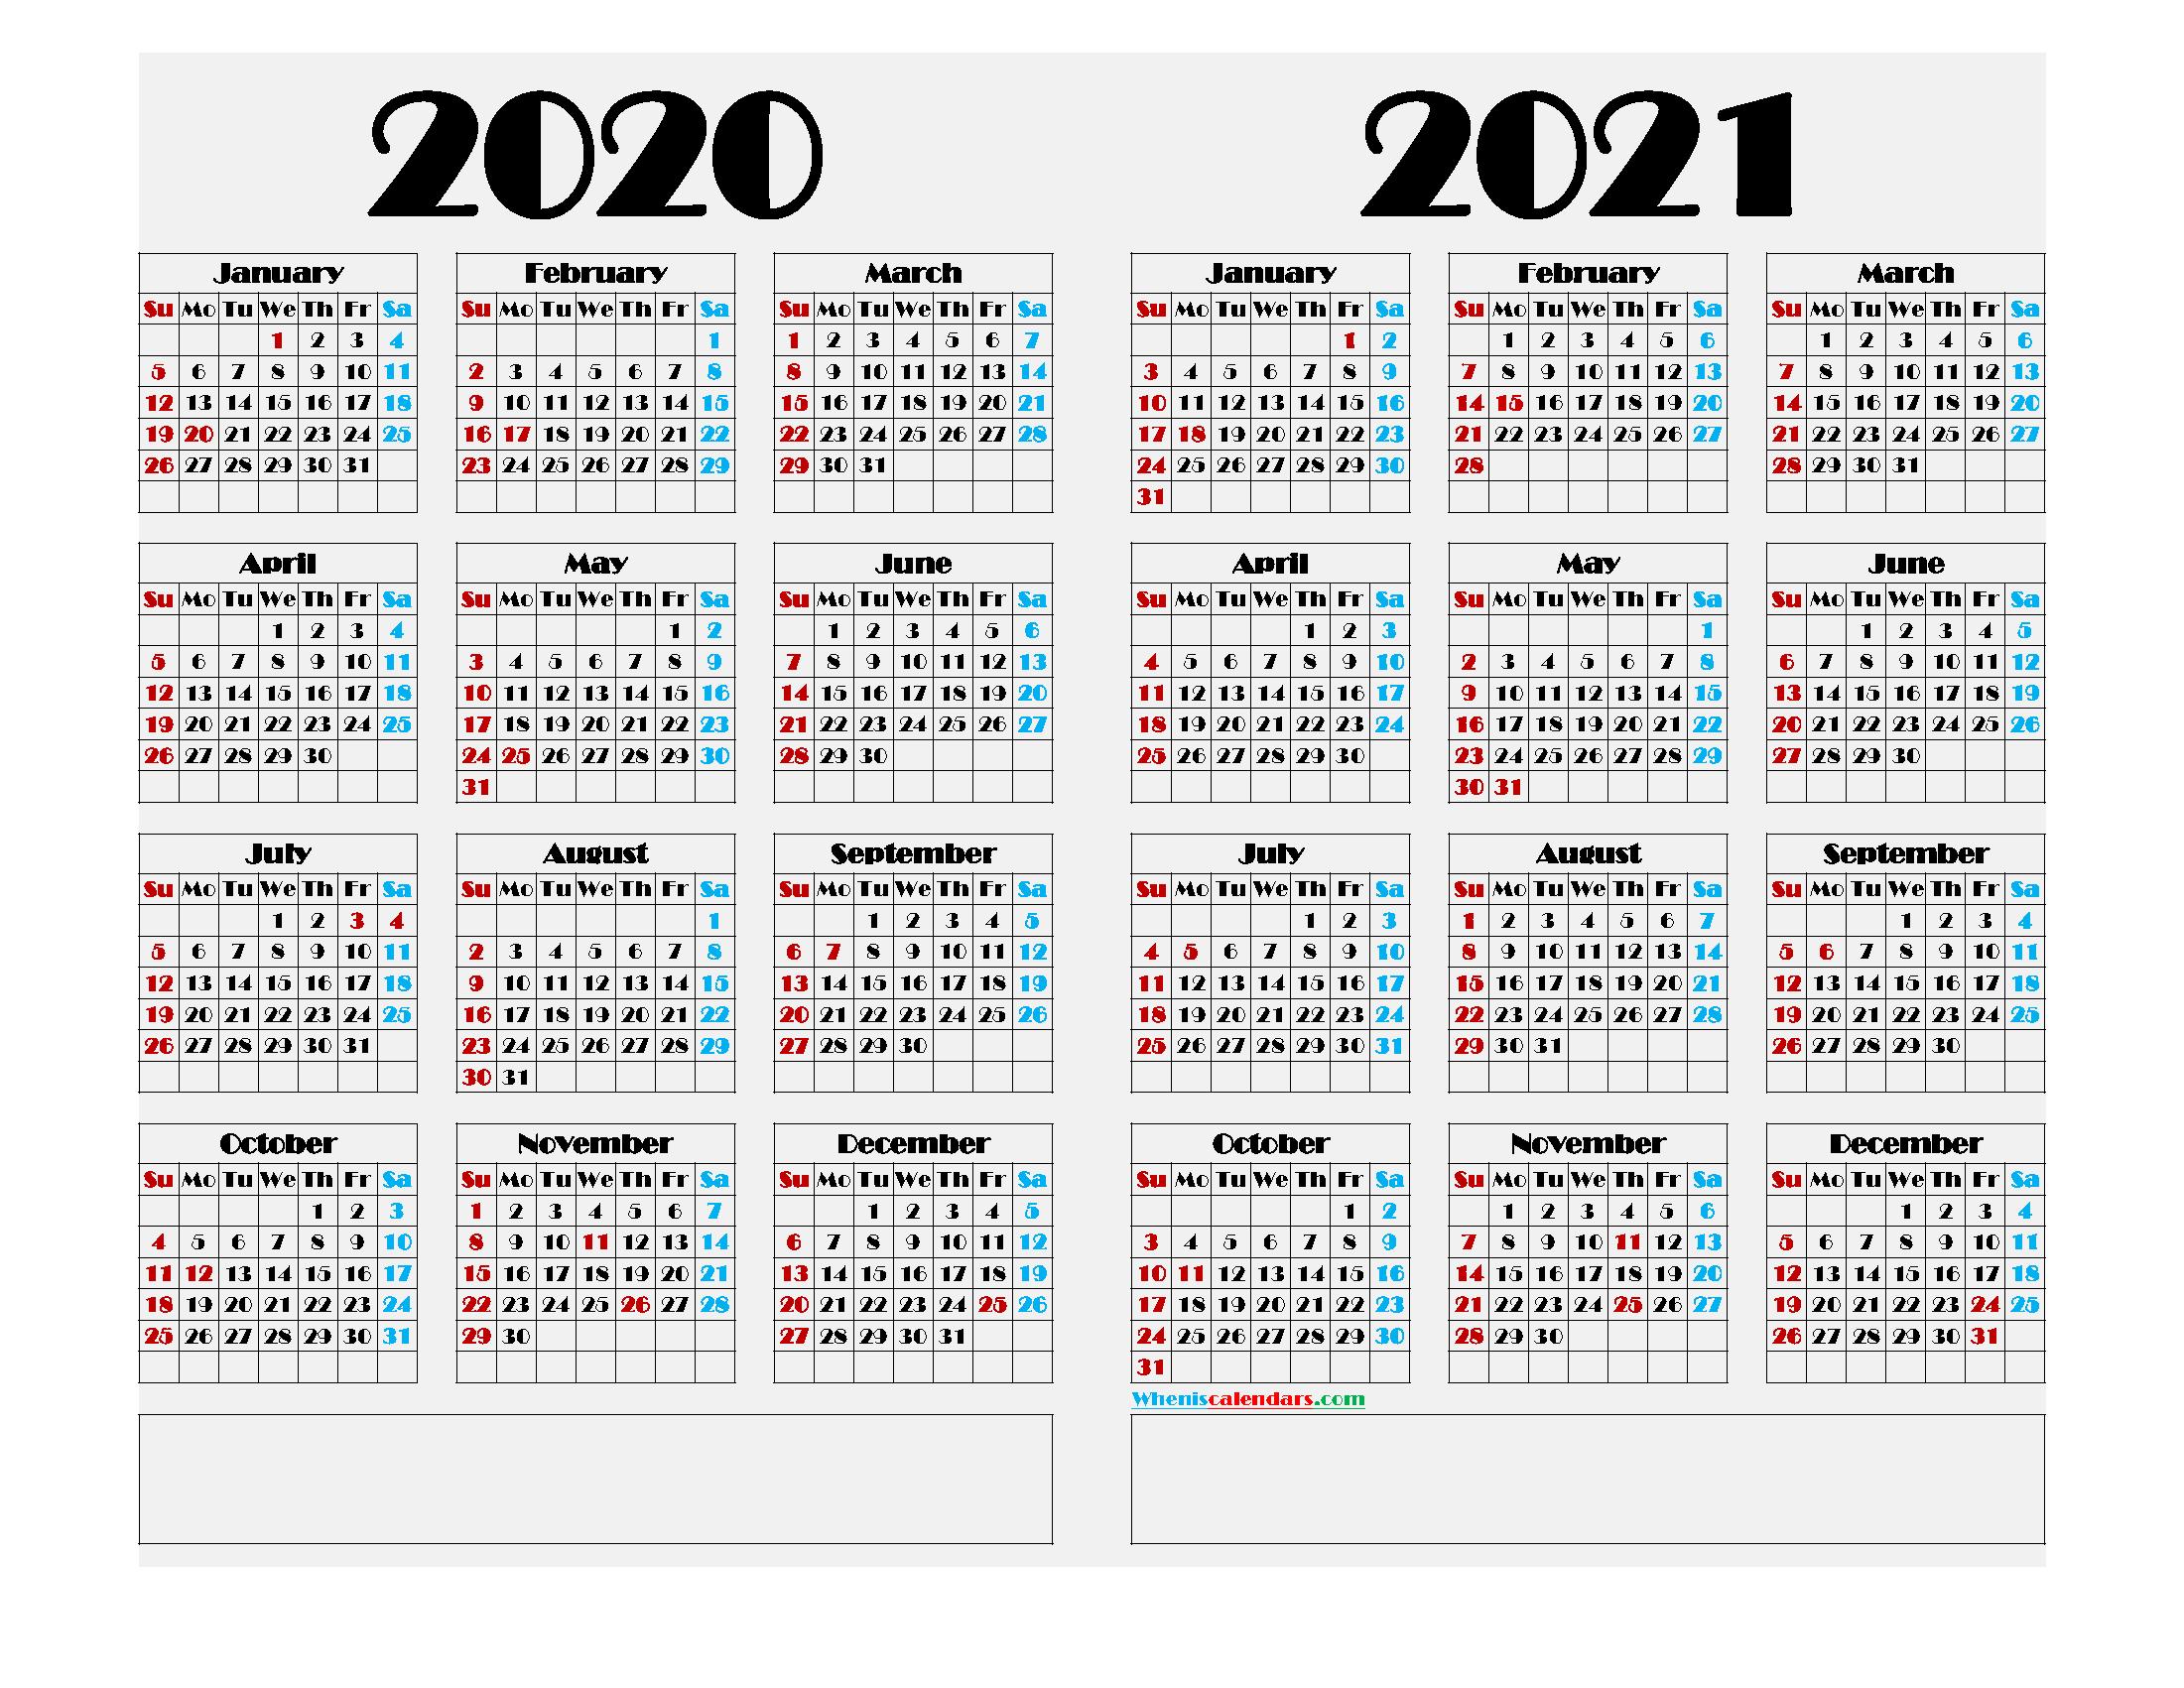 2020 and 2021 Printable Calendar Landscape - 9 Templates ...